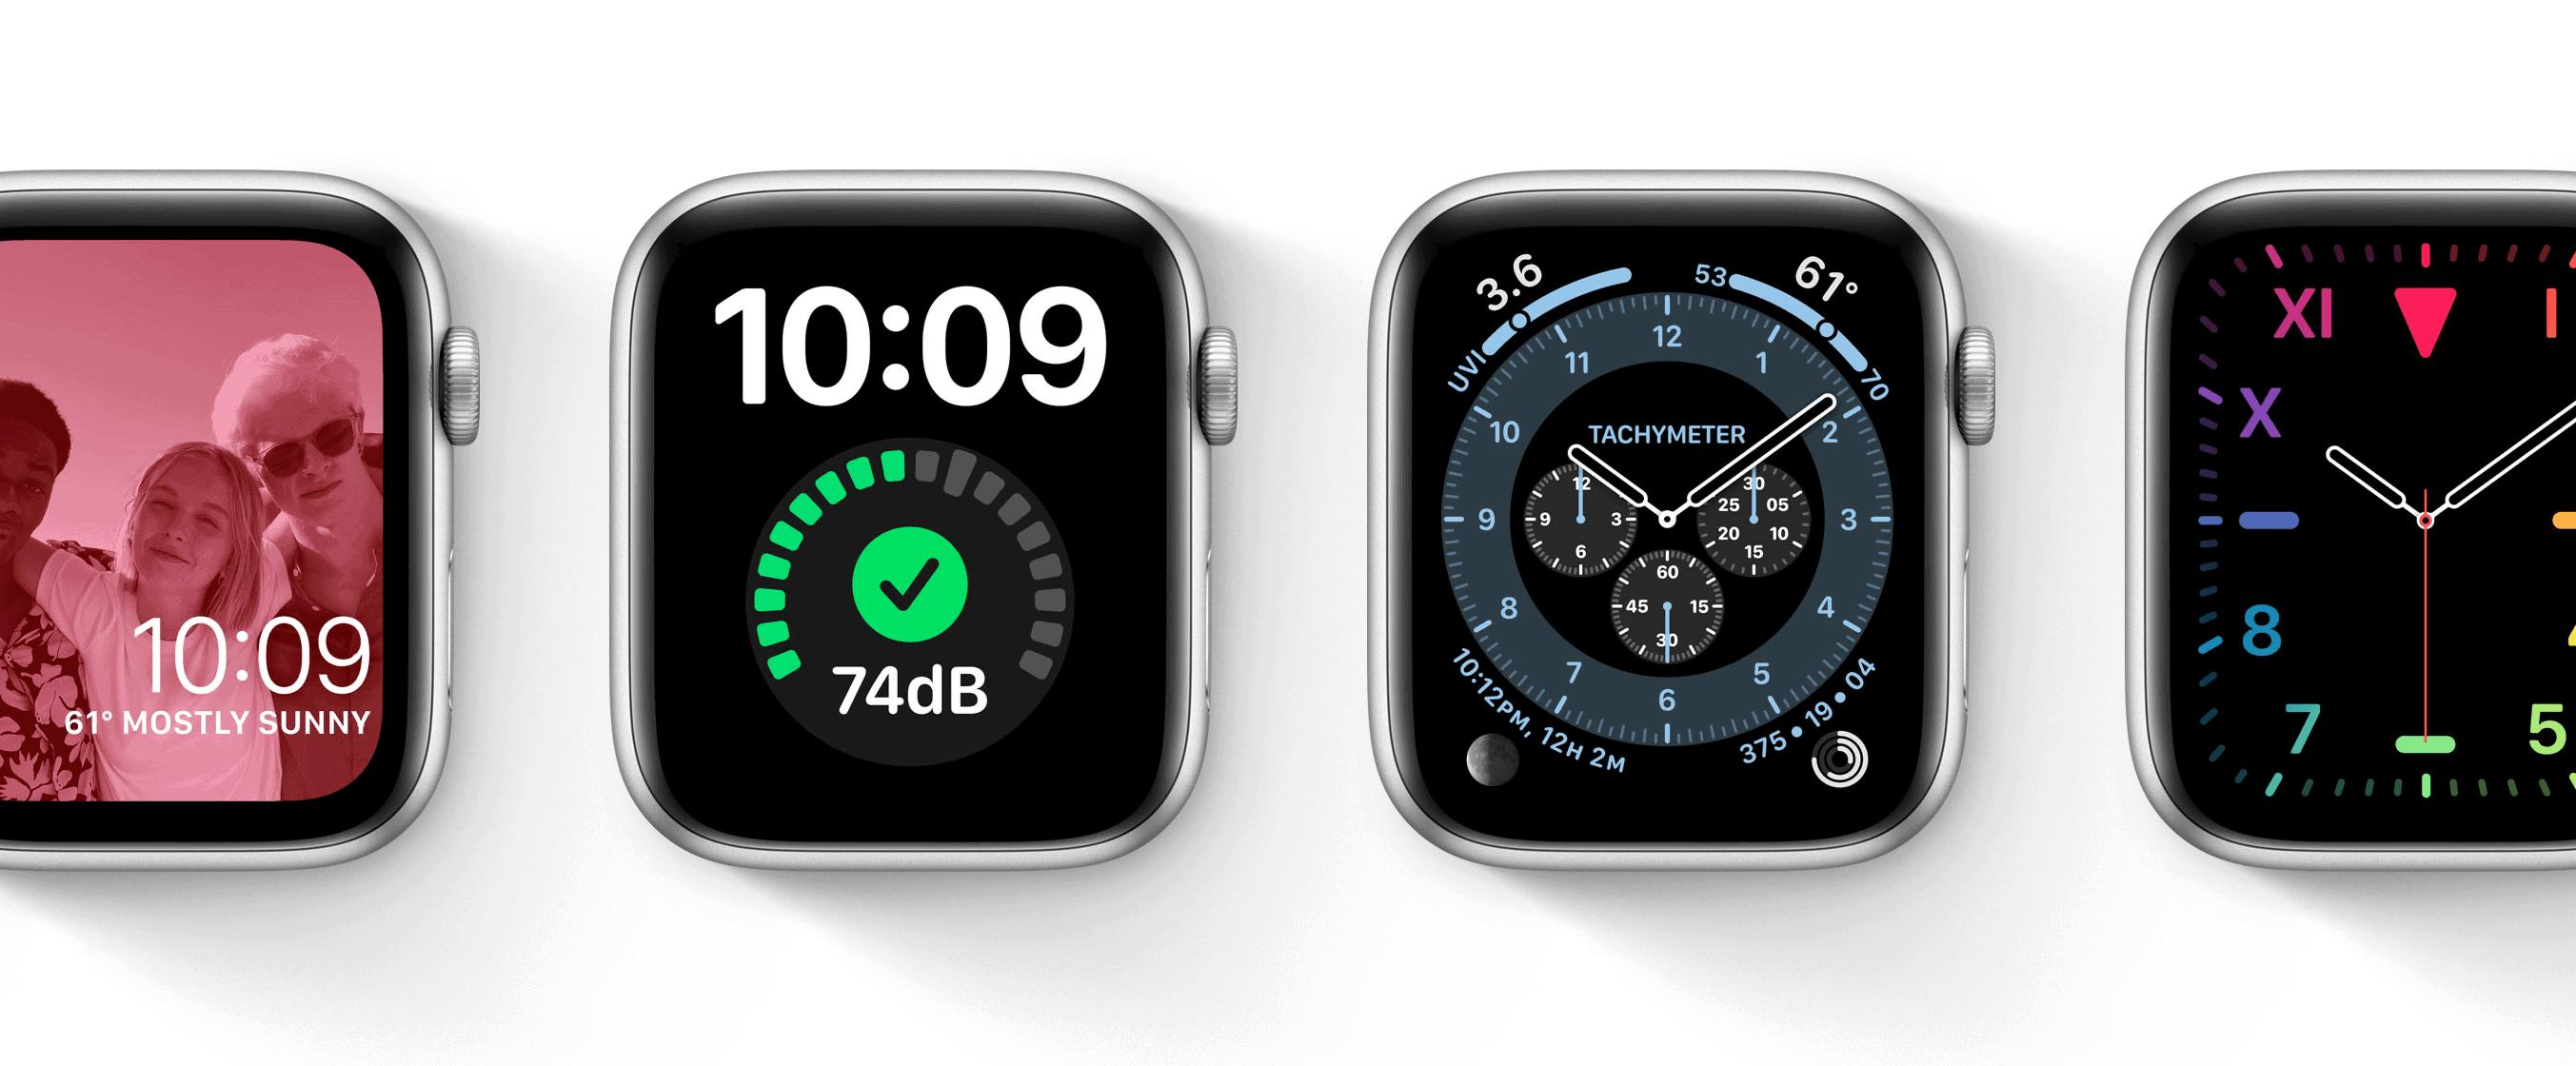 Apple Watch faces in watchOS 7